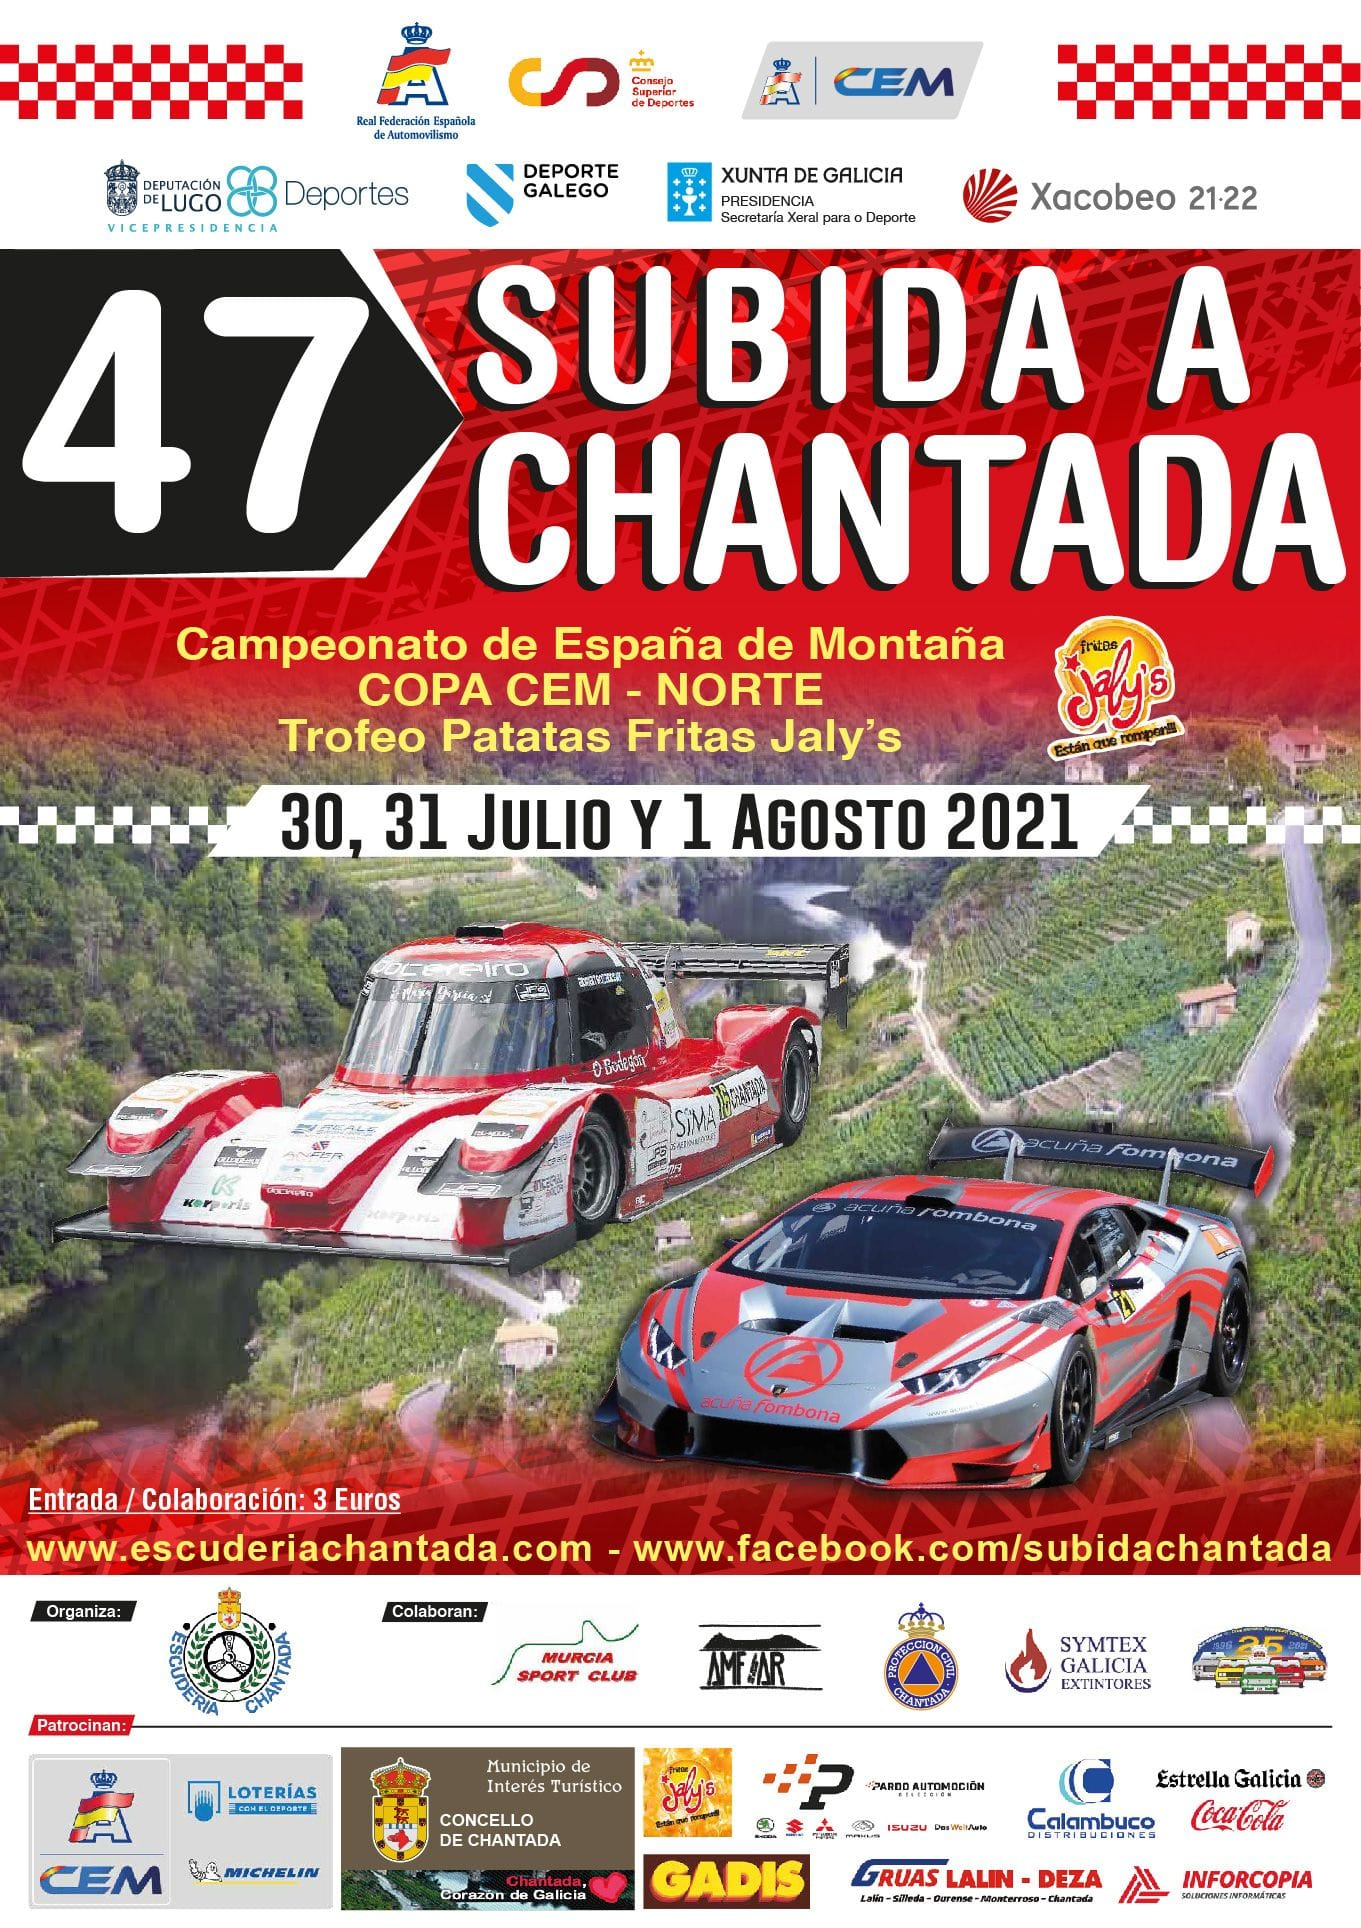 Cartel 47 Subida a Chantada 2021